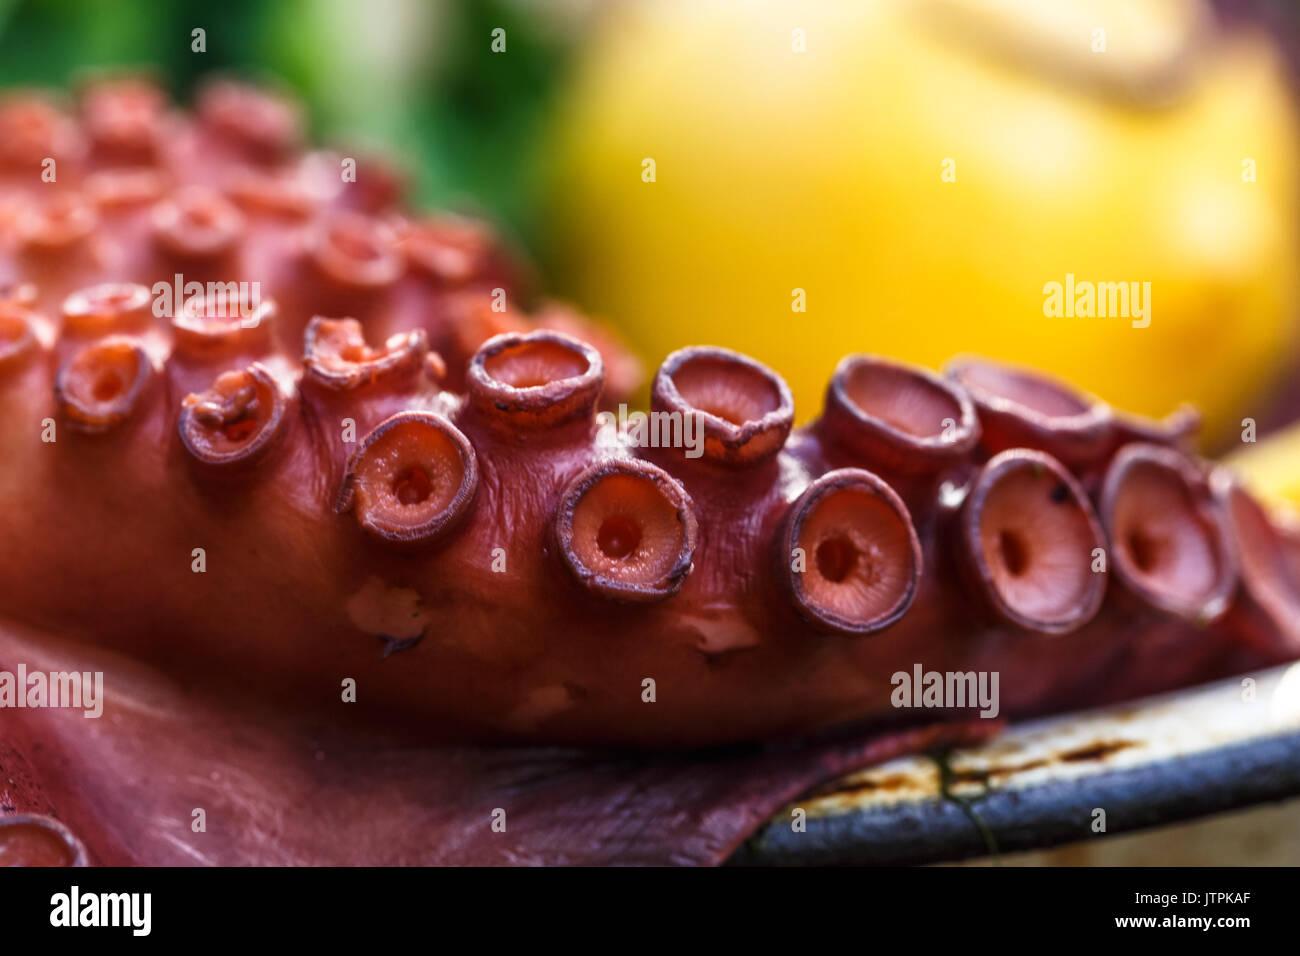 Octopus Tentakel Ansicht schließen, selektiver Fokus Stockbild